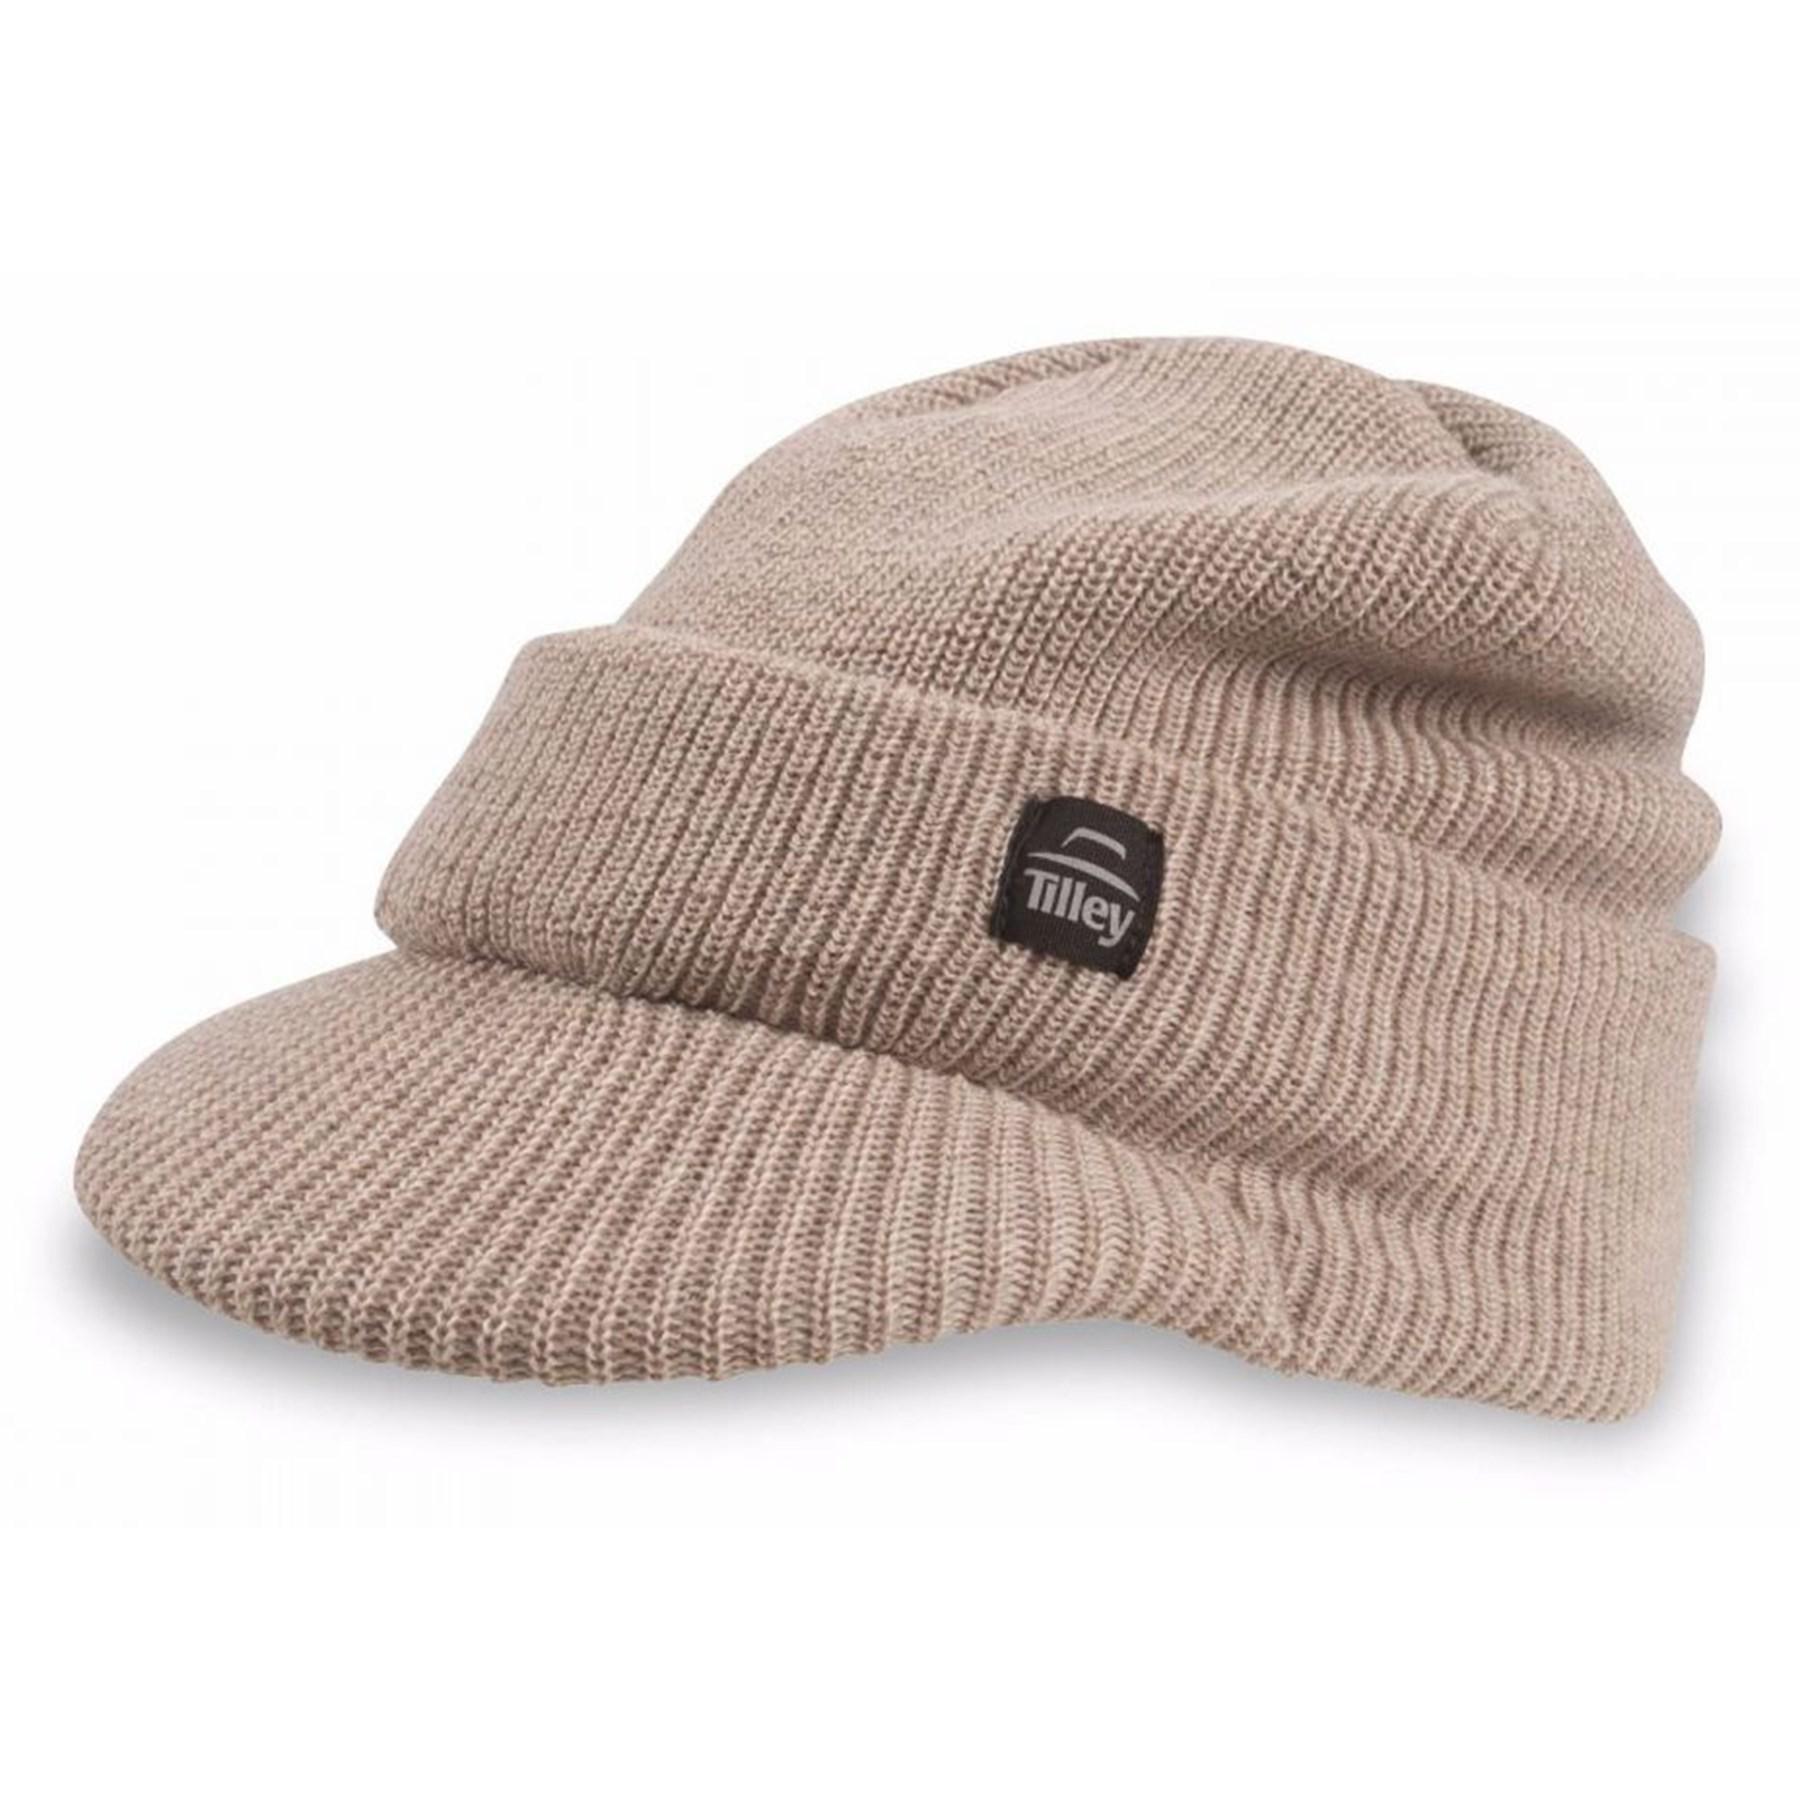 b3e07499 Tilley Radar Toque Hat for Men - Lyst